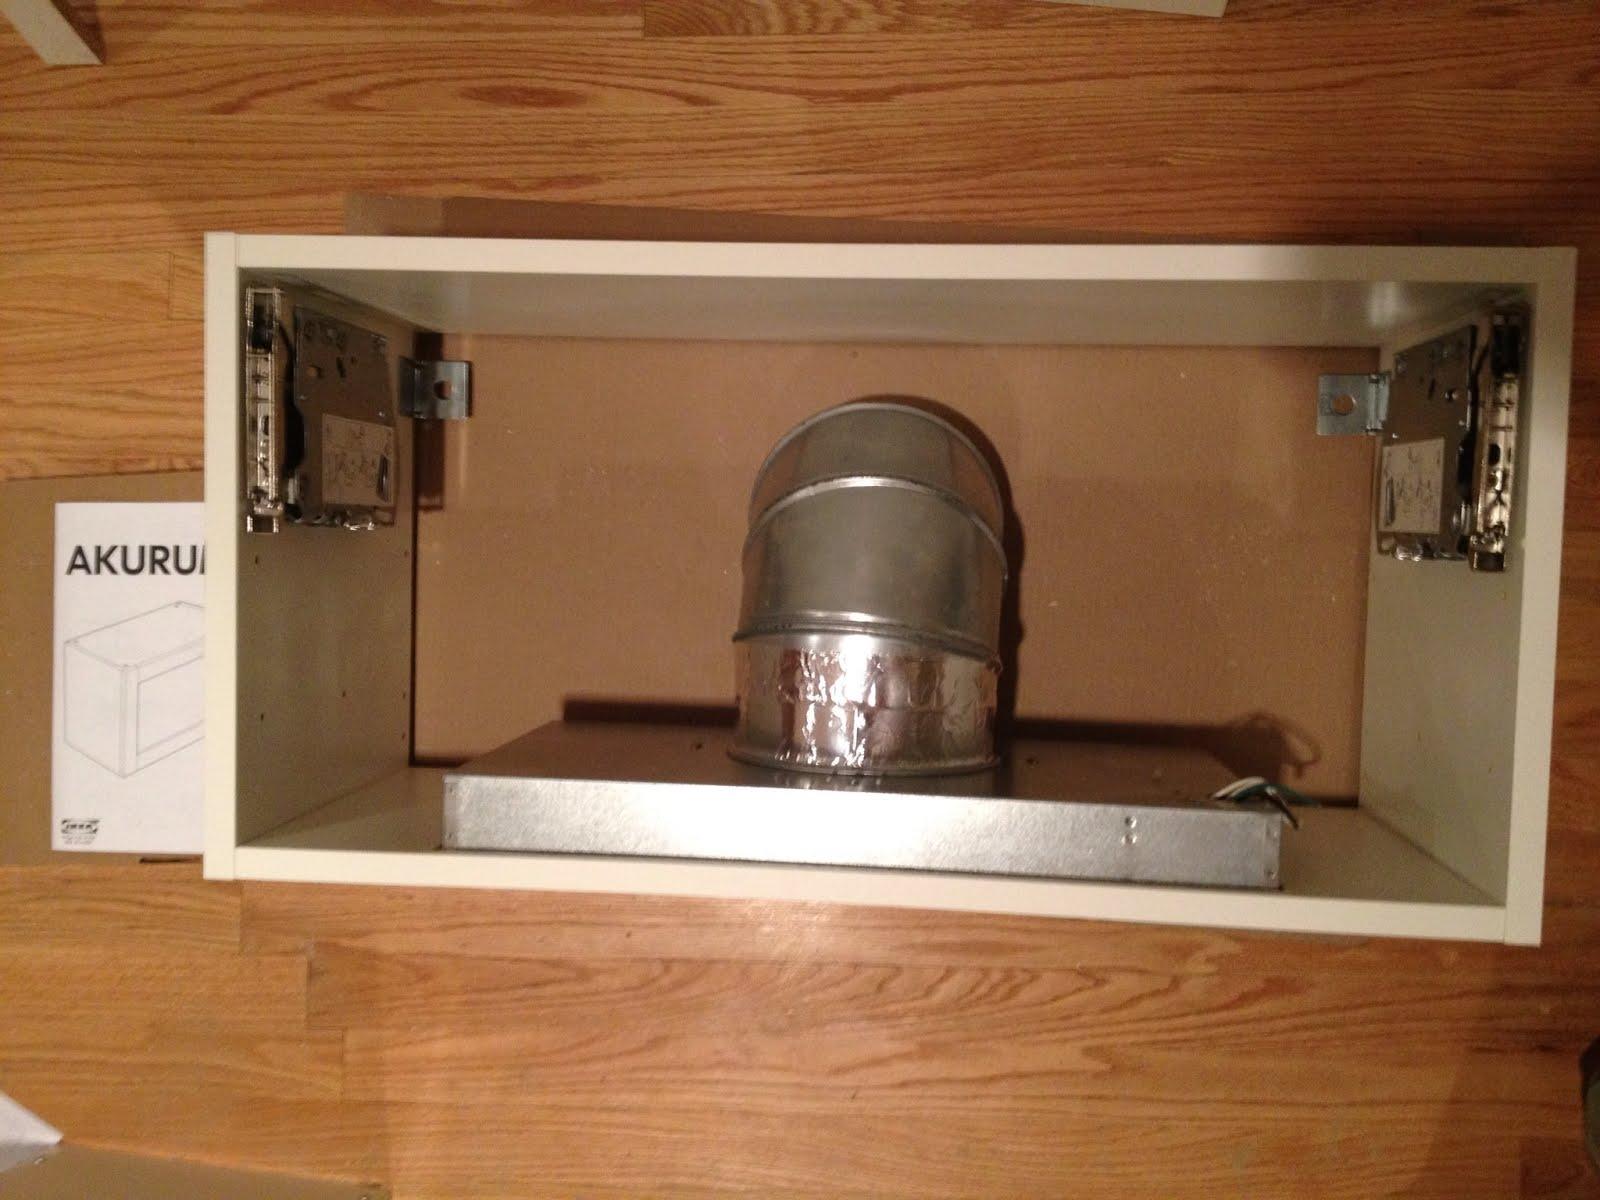 Horizontal vent hood, wine rack / bookshelf mash up - IKEA